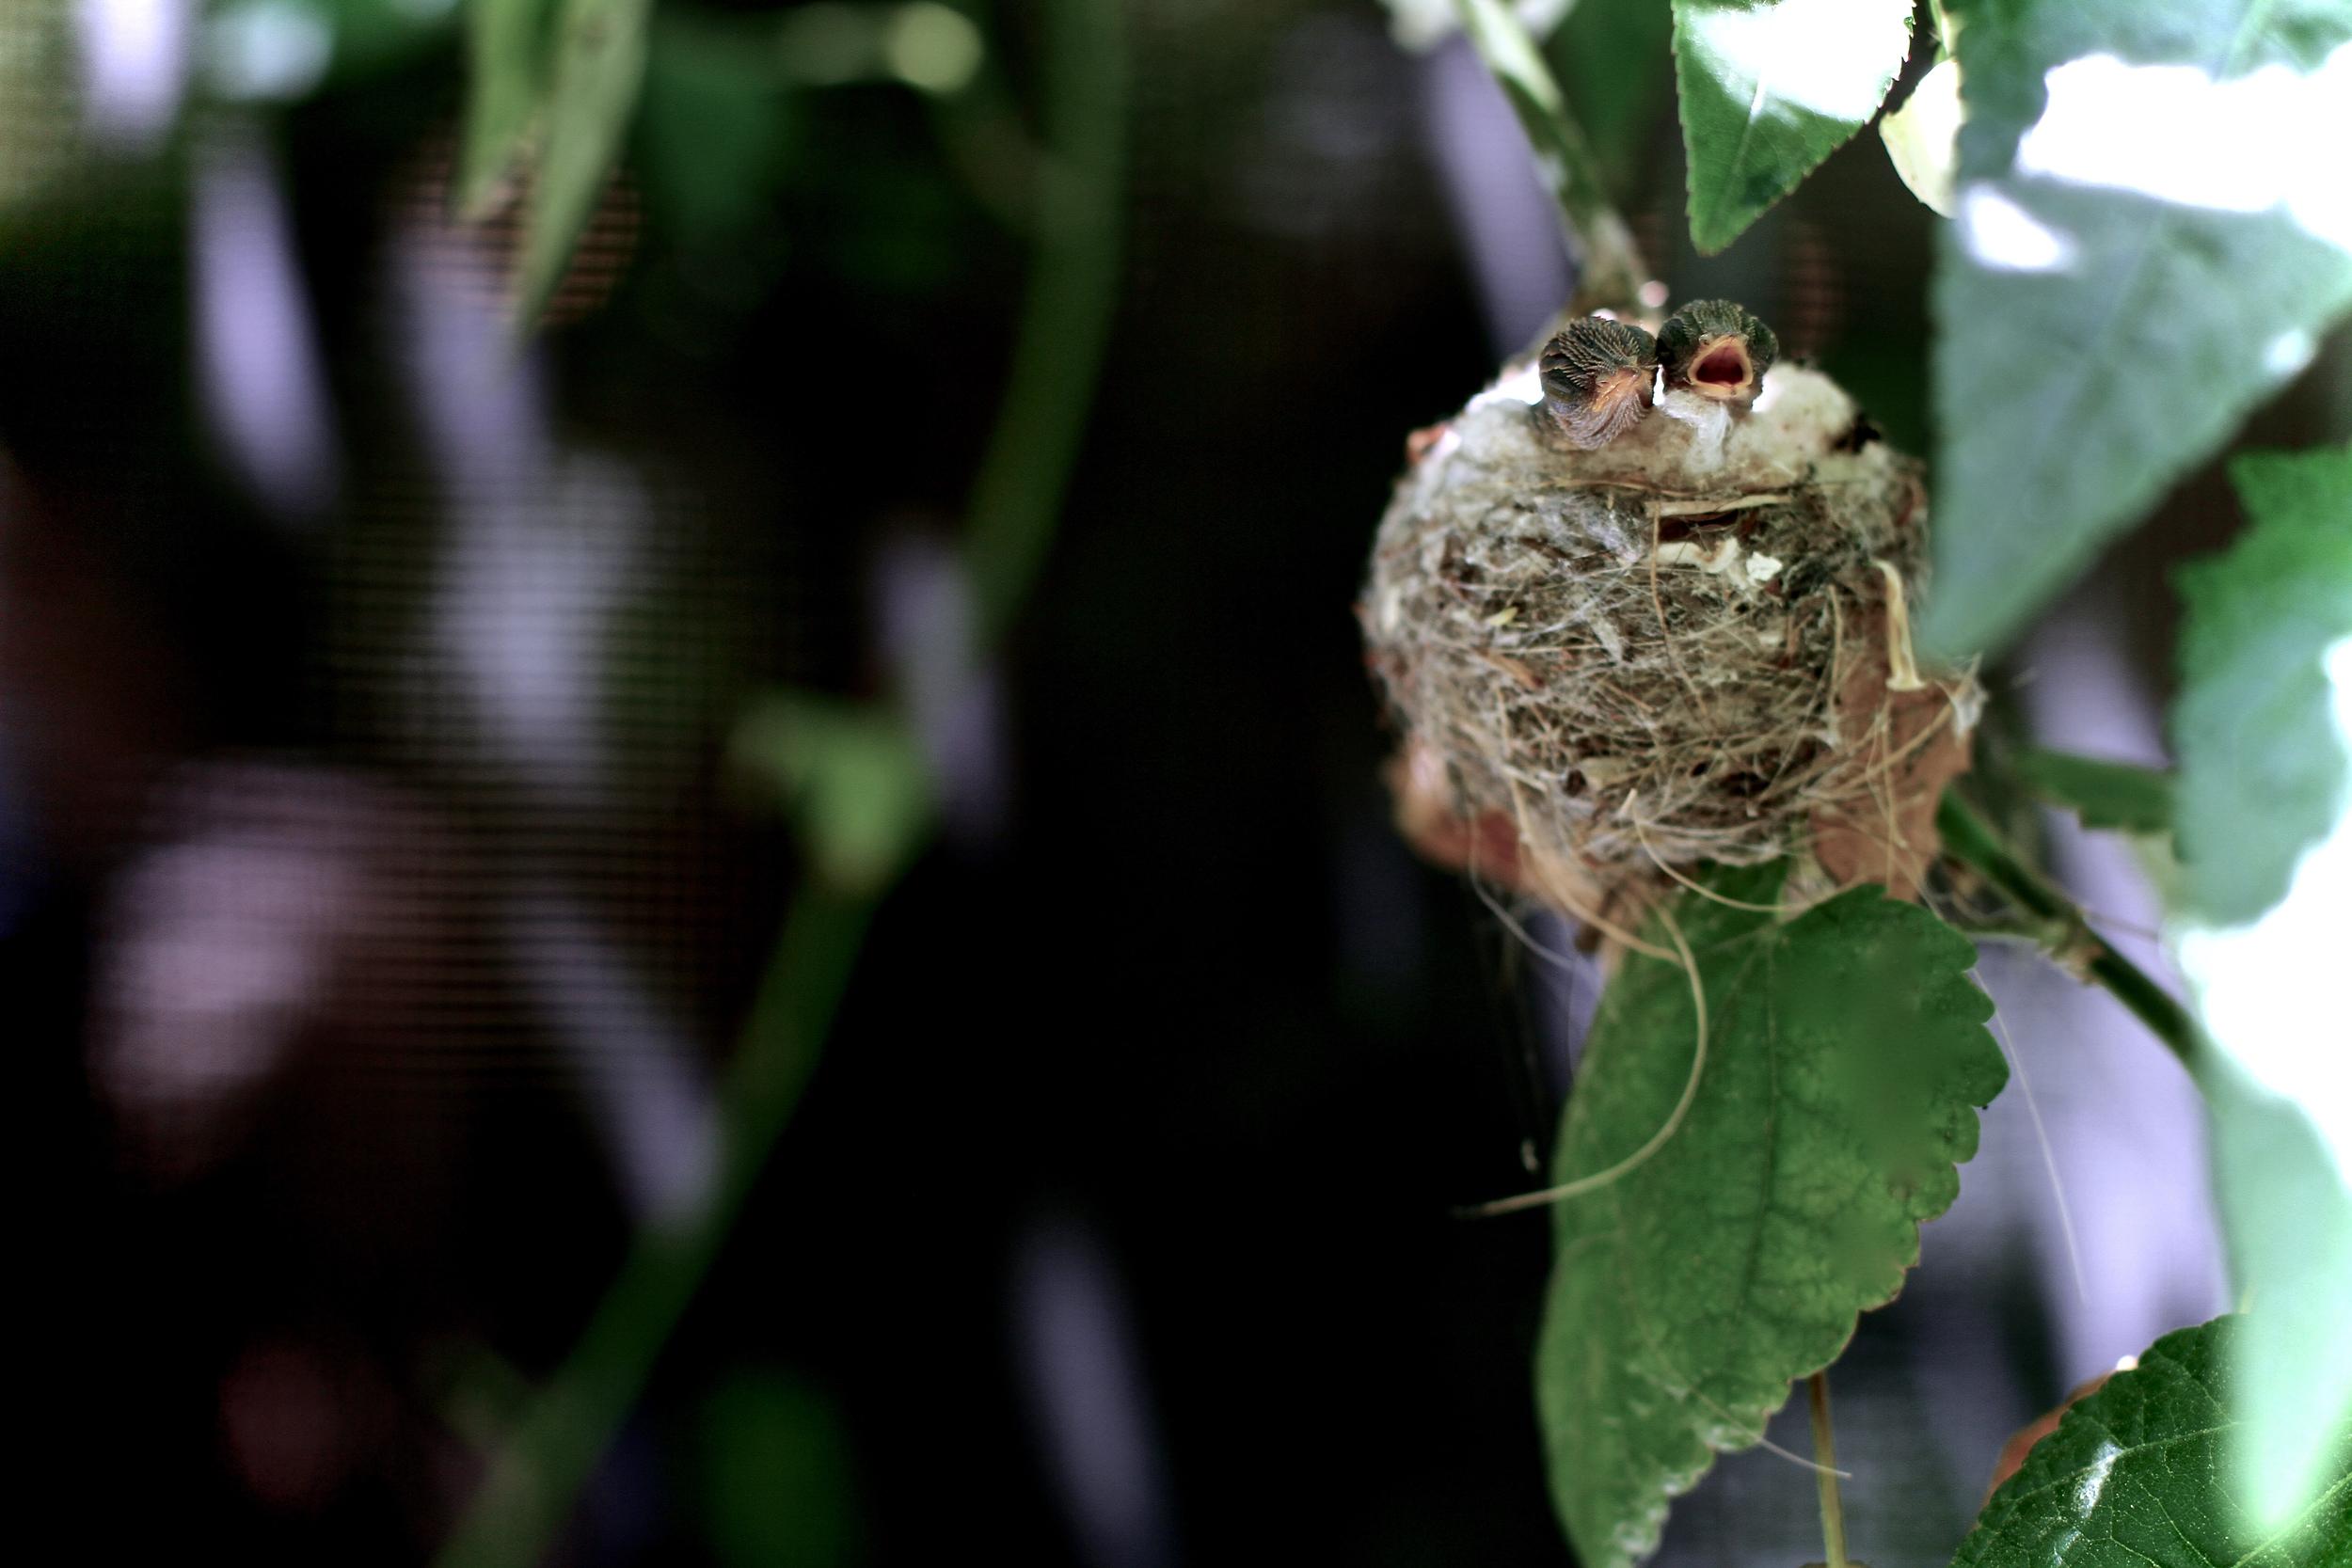 Hatched | Hummingbird Chicks | Santa Monica, California 2013 | Photo by Amanda Michaels-Zech